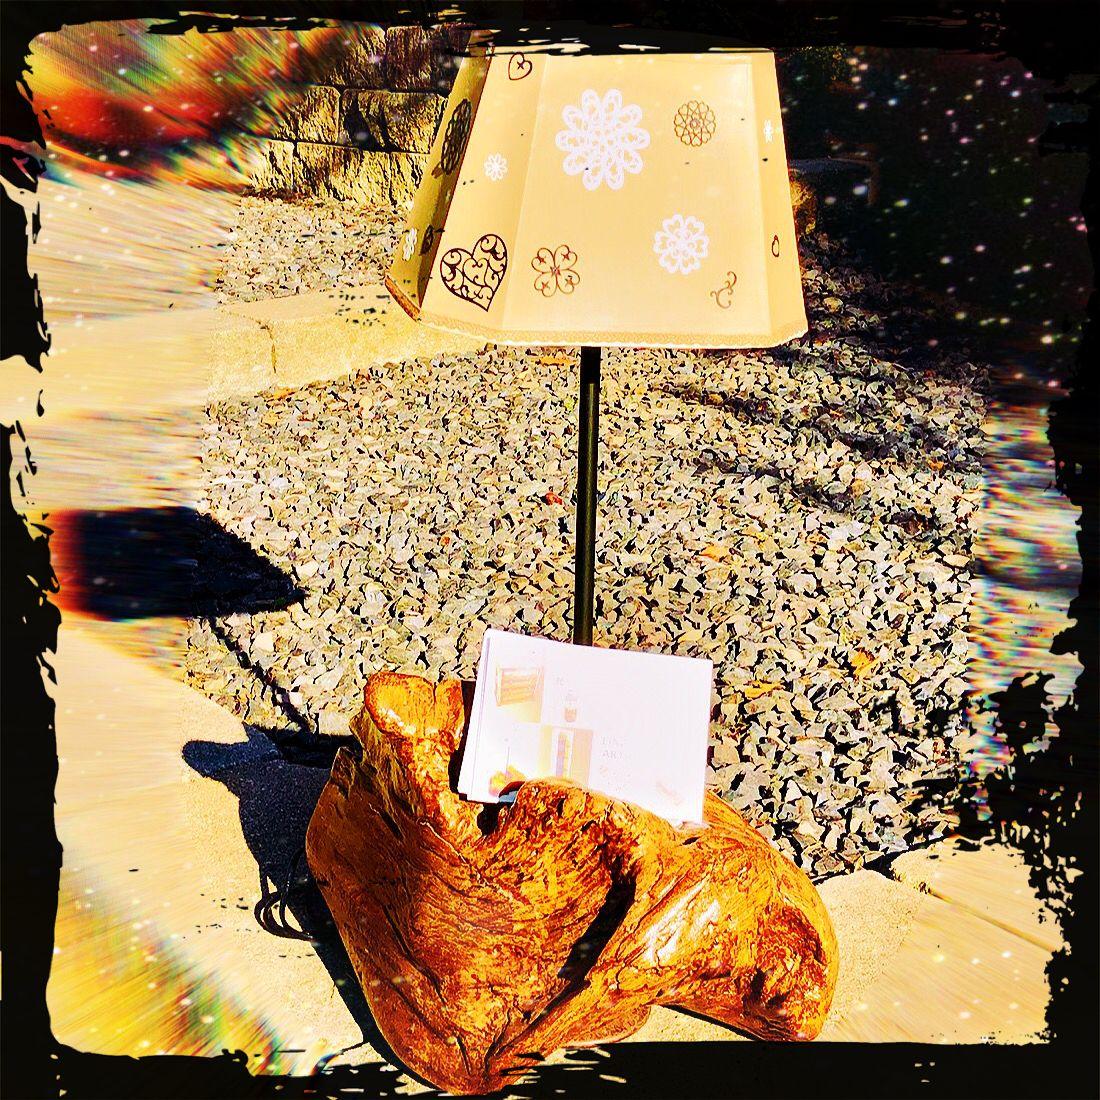 Diy Kreativ Lampen Aus Upcycling Kunst Taglich Ein Neuer Kreafreikunst Lampenpin Heute Natuerlich Holz T Treibholz Lampe Lampen Kaufen Lampen